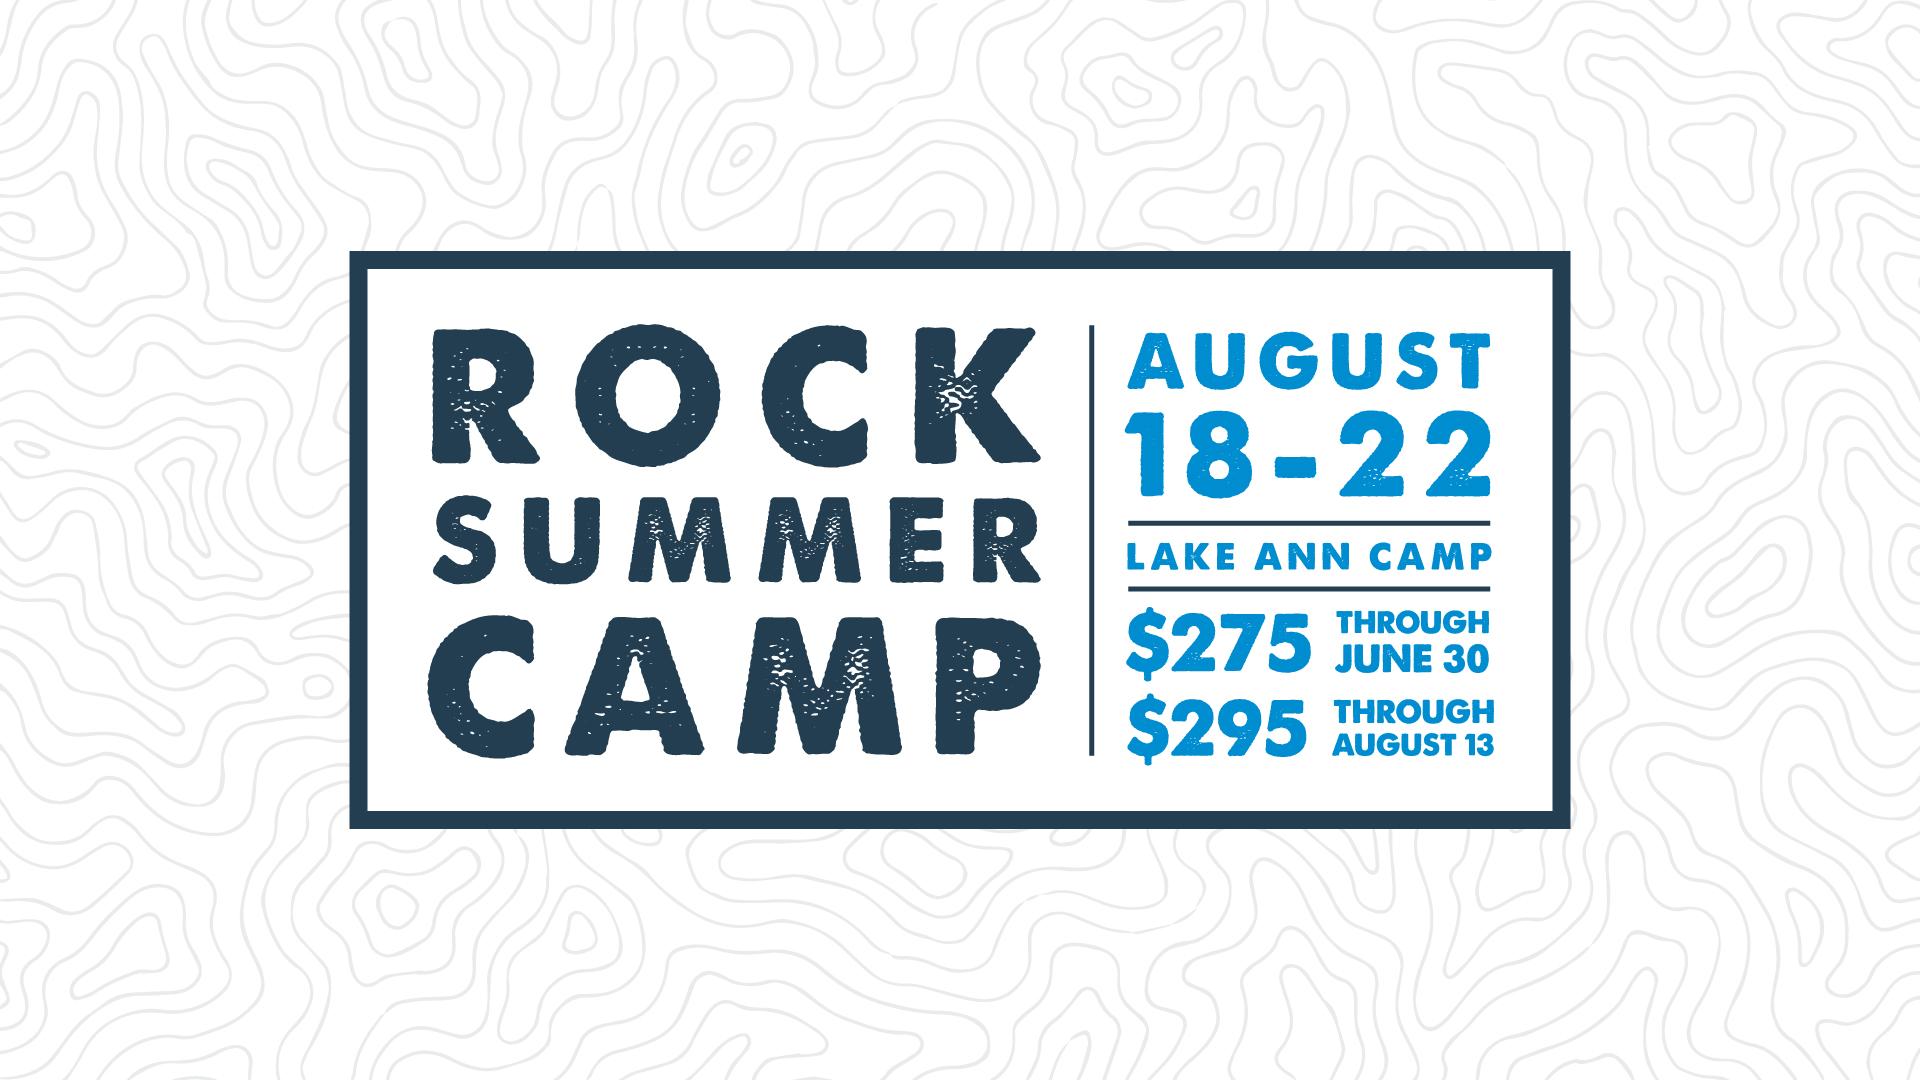 Summercamp17 earlybird